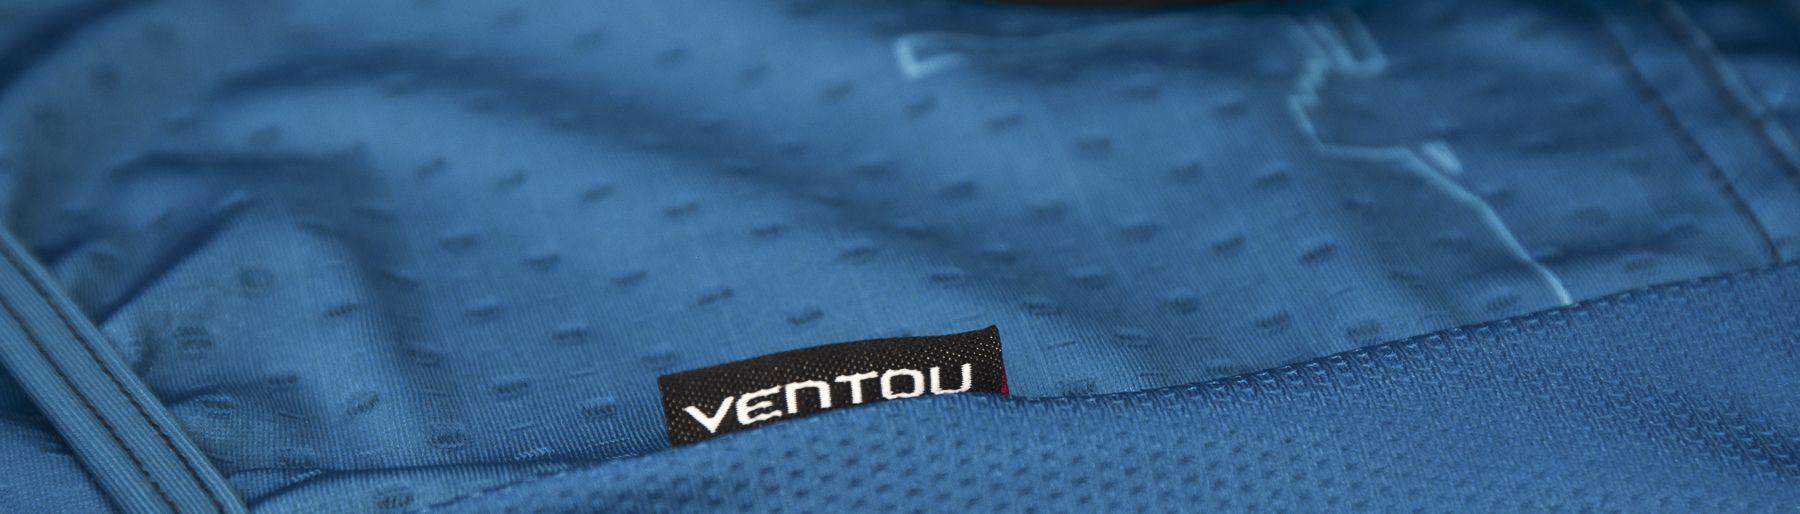 Ventou FlatLay_HR-41